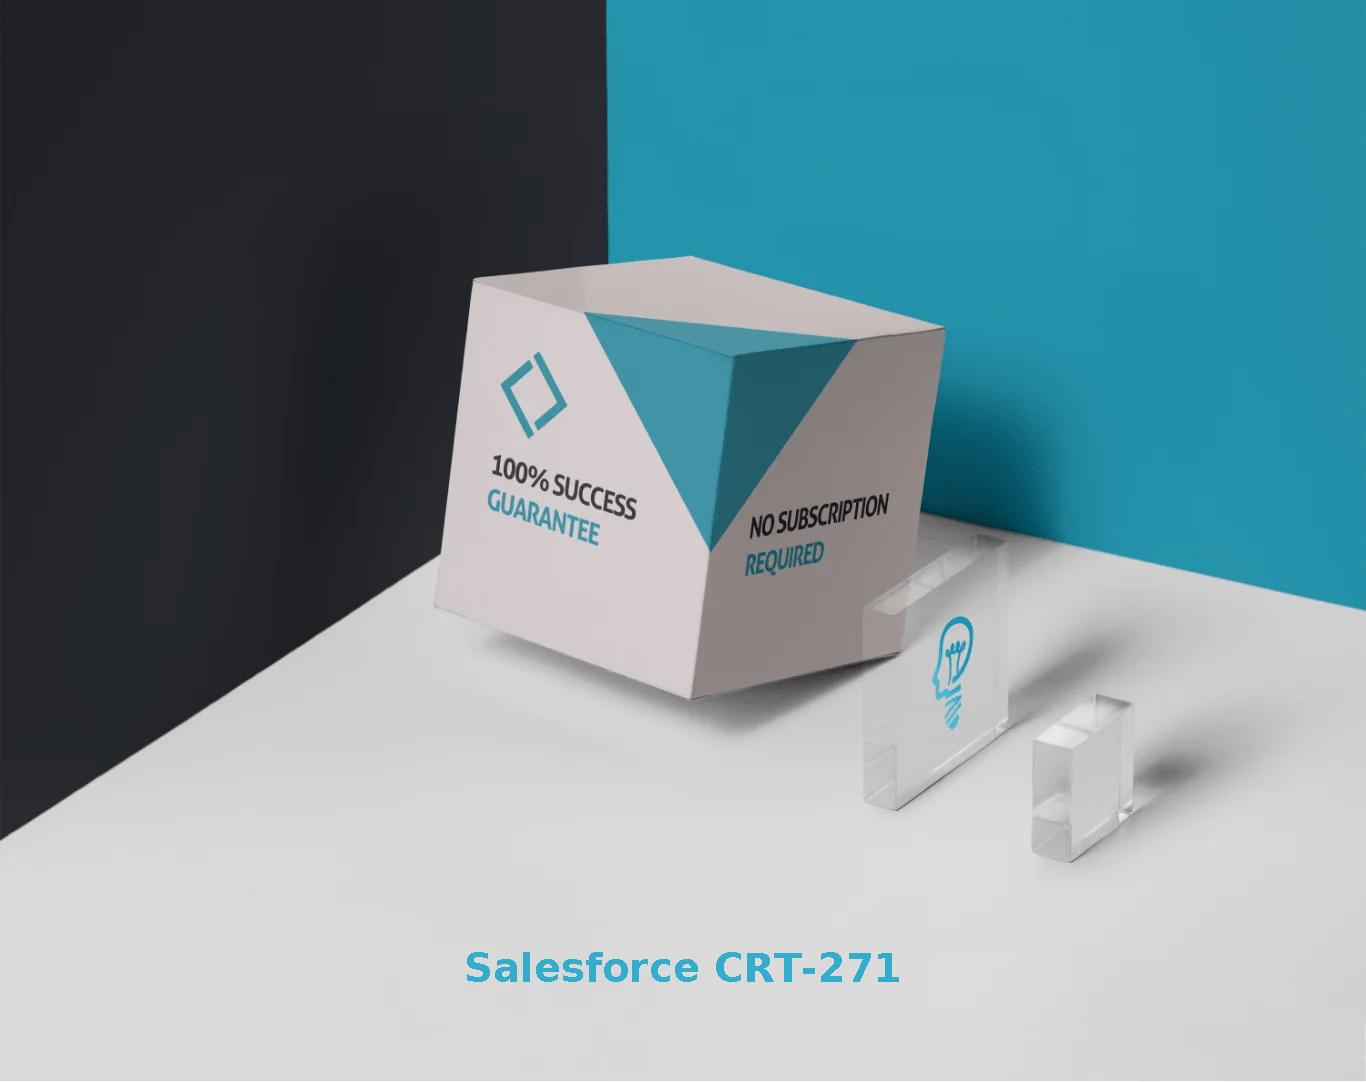 Salesforce CRT-271 Exams